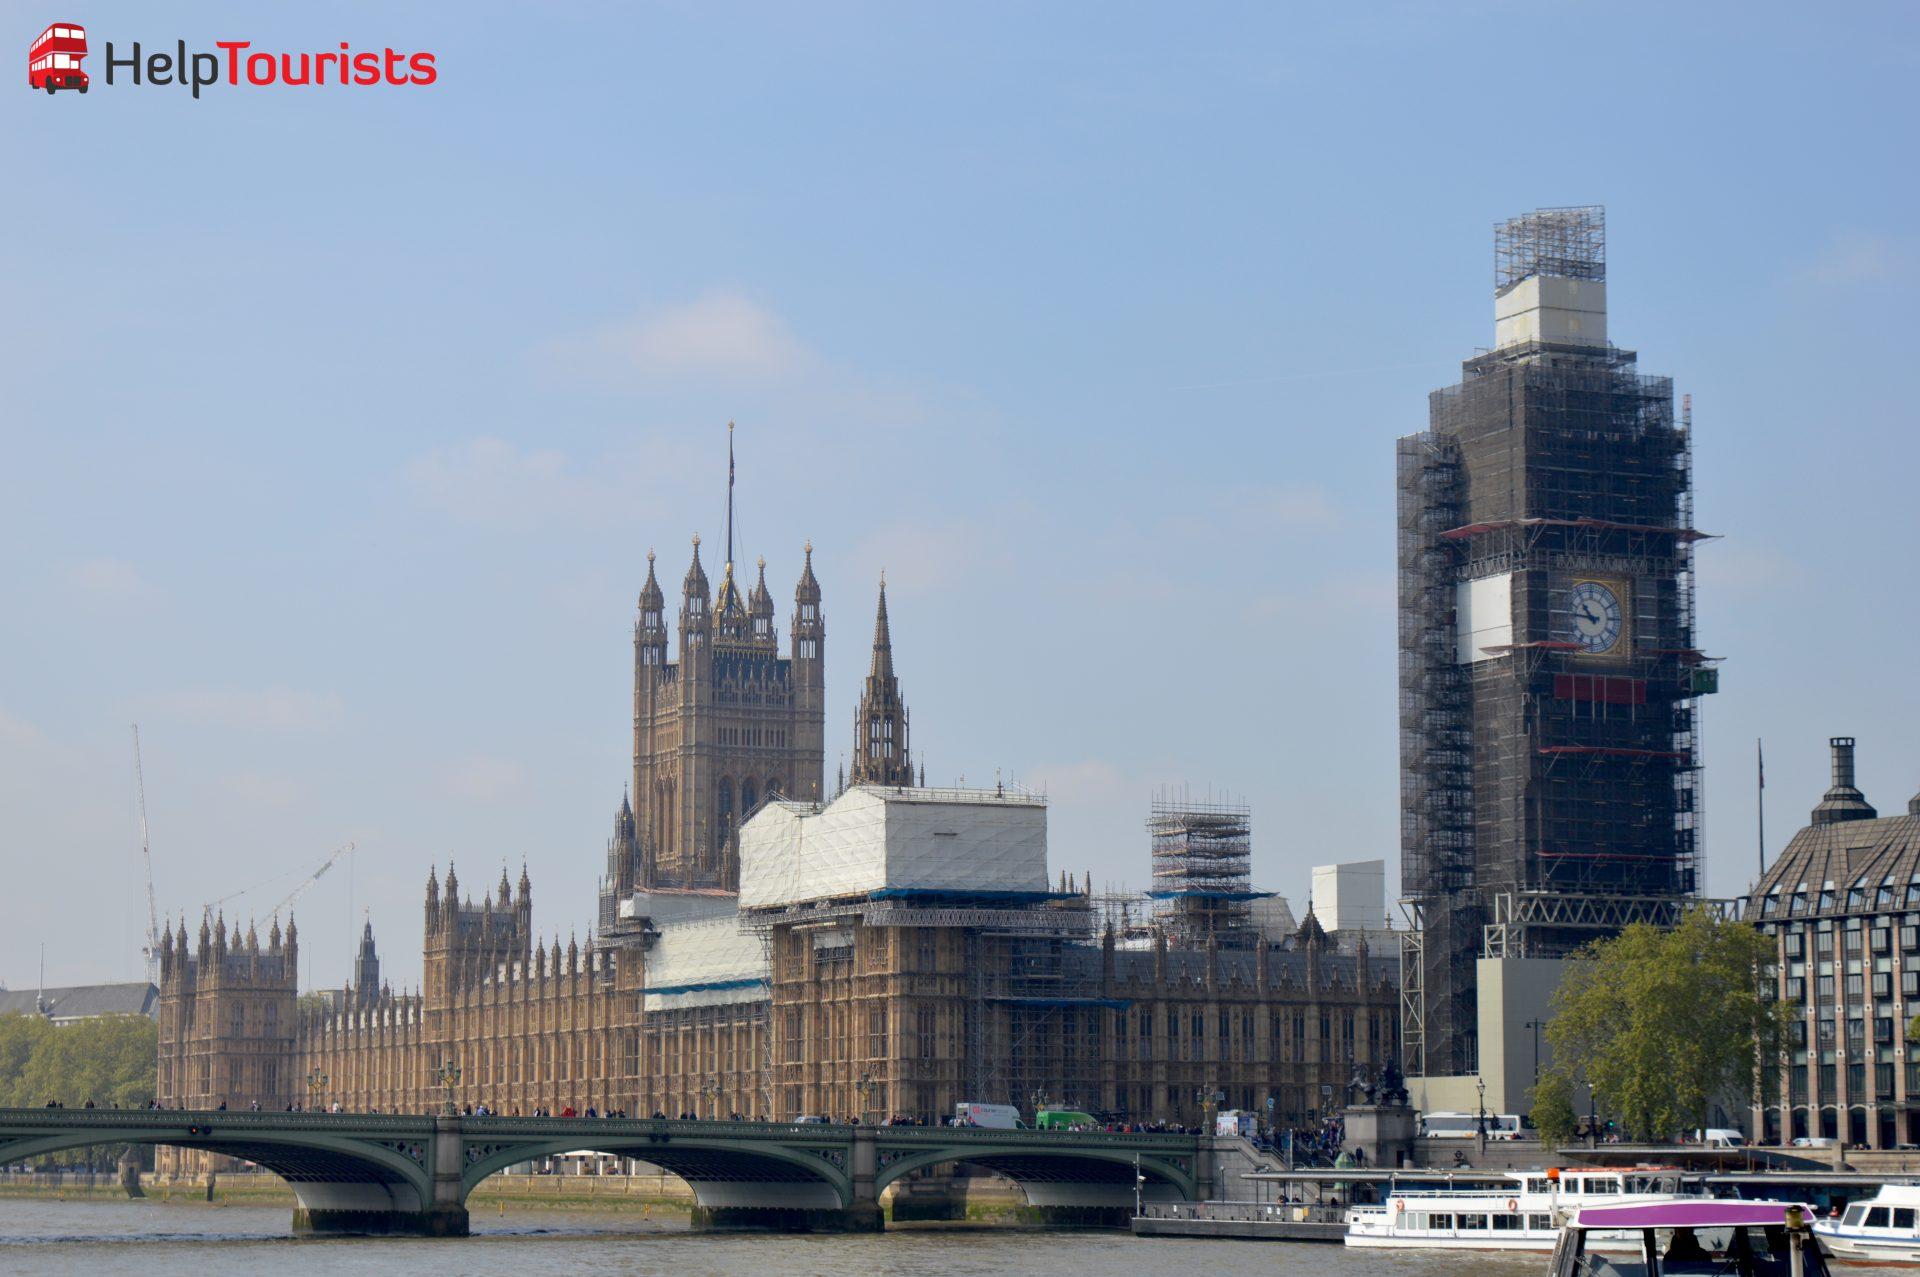 Westminster Palace und Big Ben Bauarbeiten London